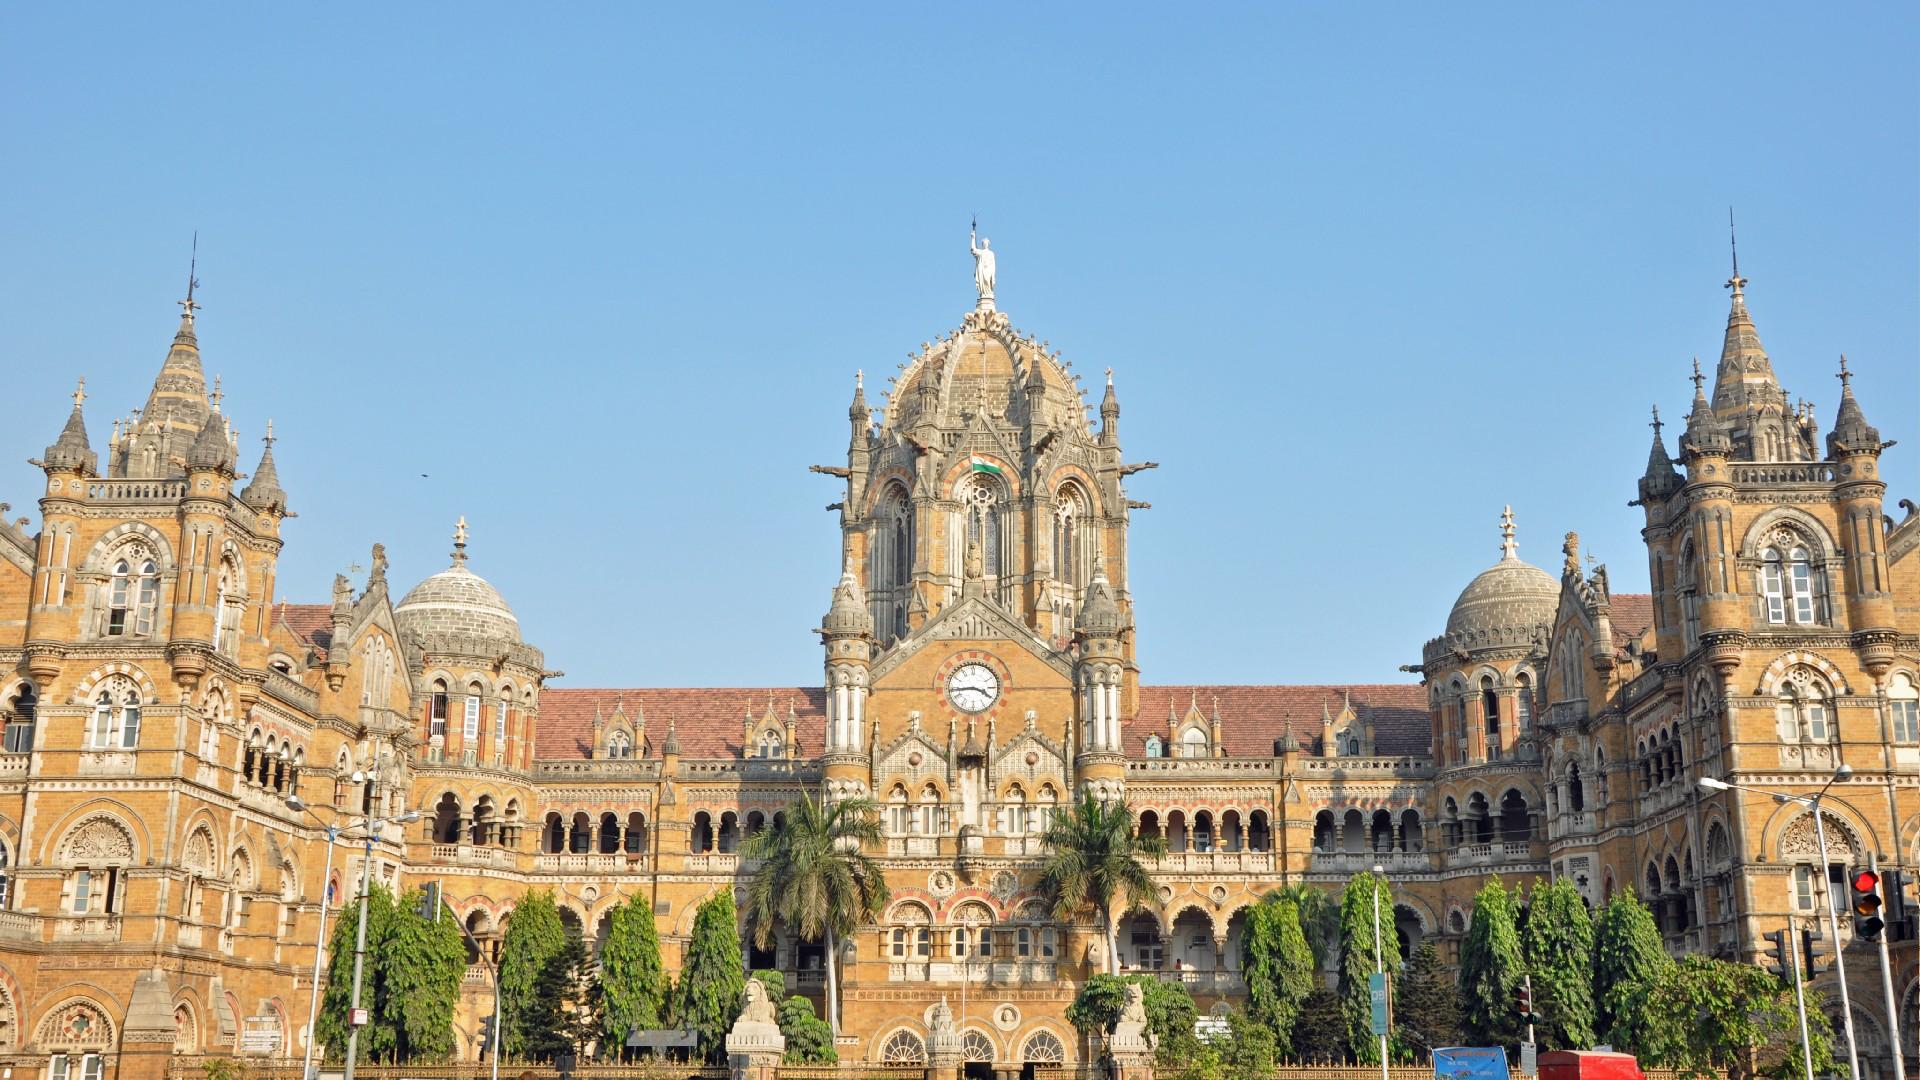 Chatrapati Shivani Termianl Mumbai